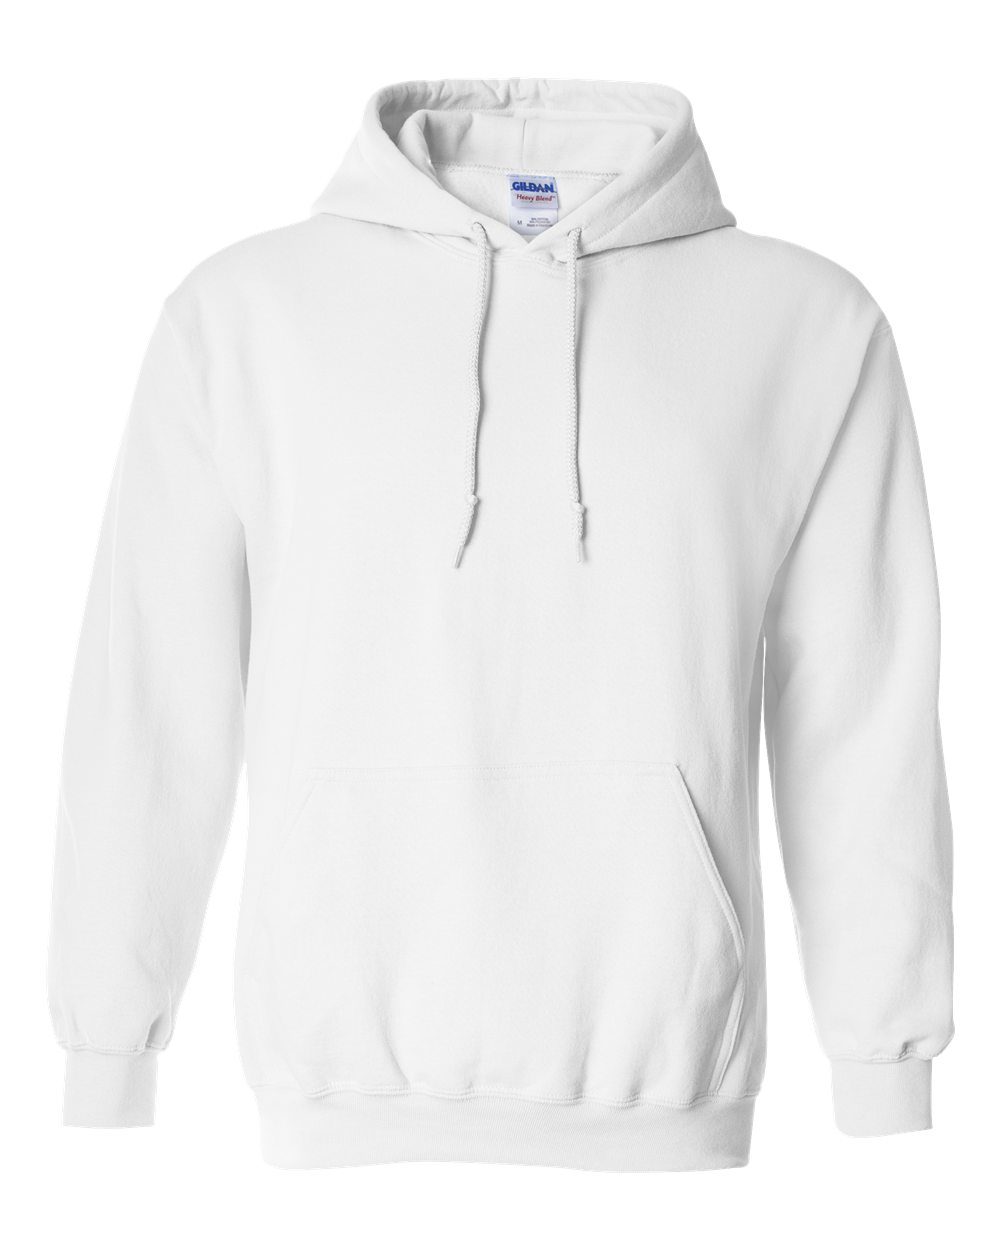 Heavy Blend Hooded Sweatshirt – 18500